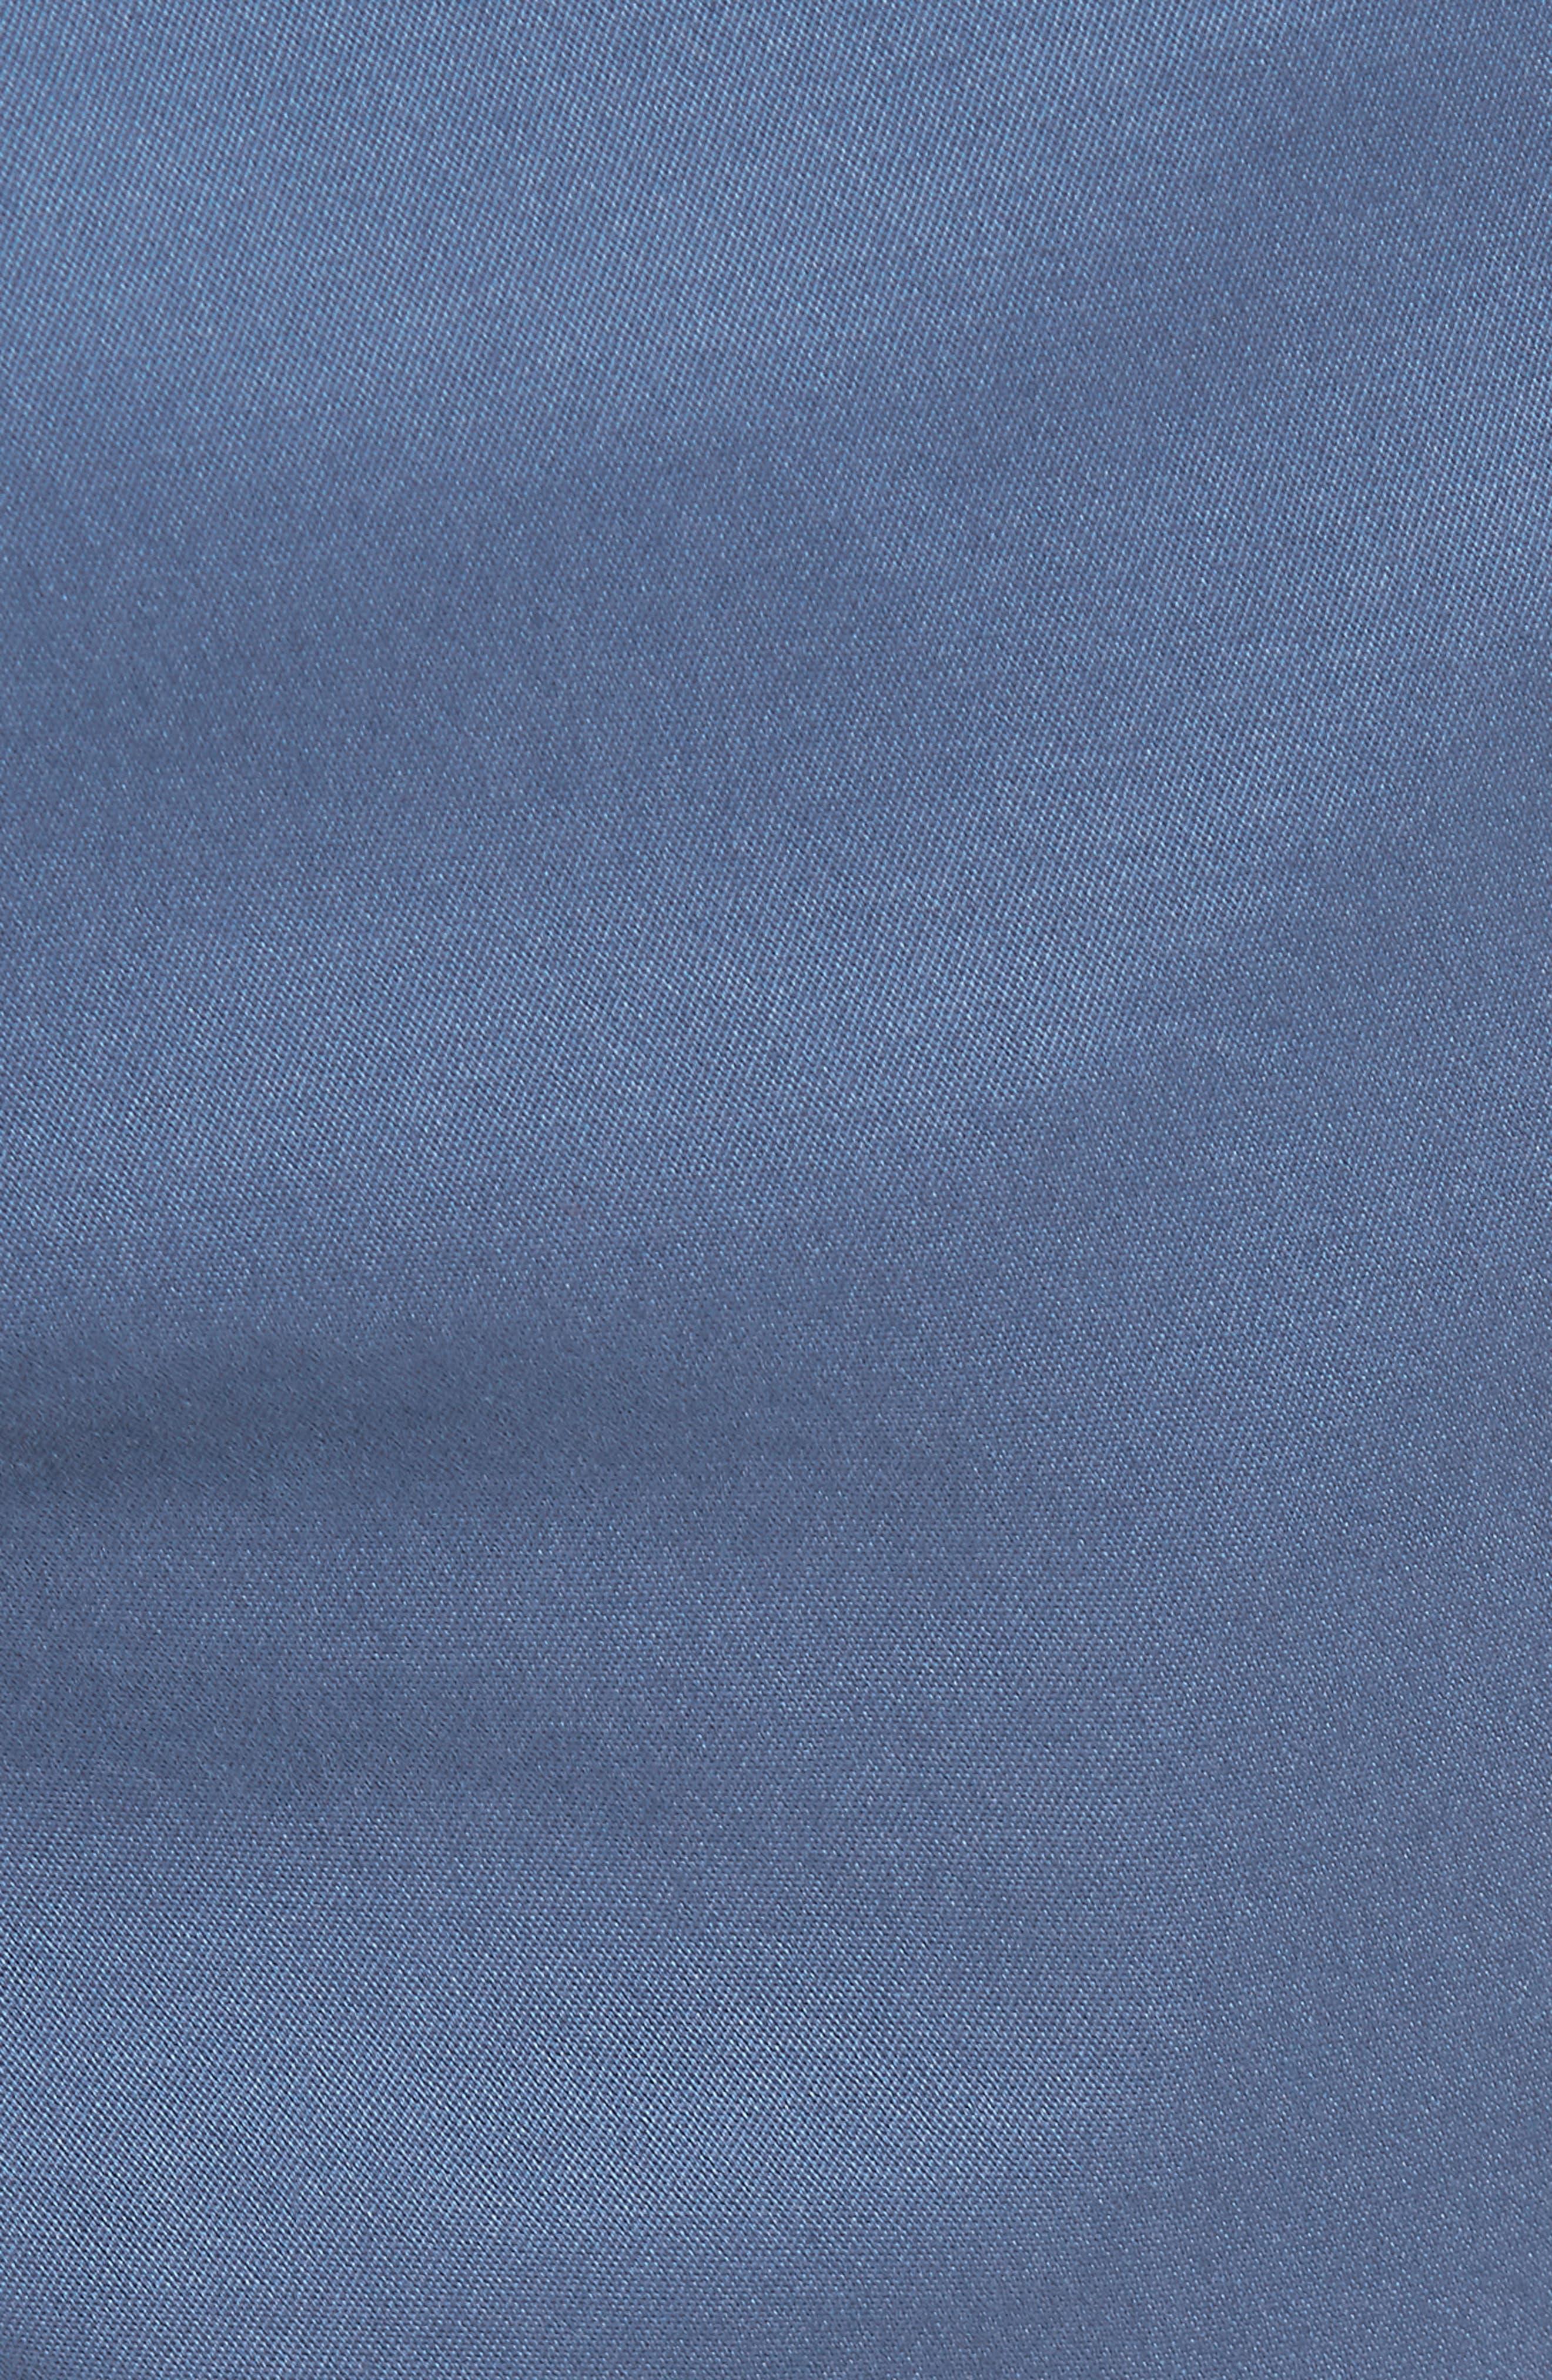 Jetty Stretch Cotton Shorts,                             Alternate thumbnail 5, color,                             Moonshine